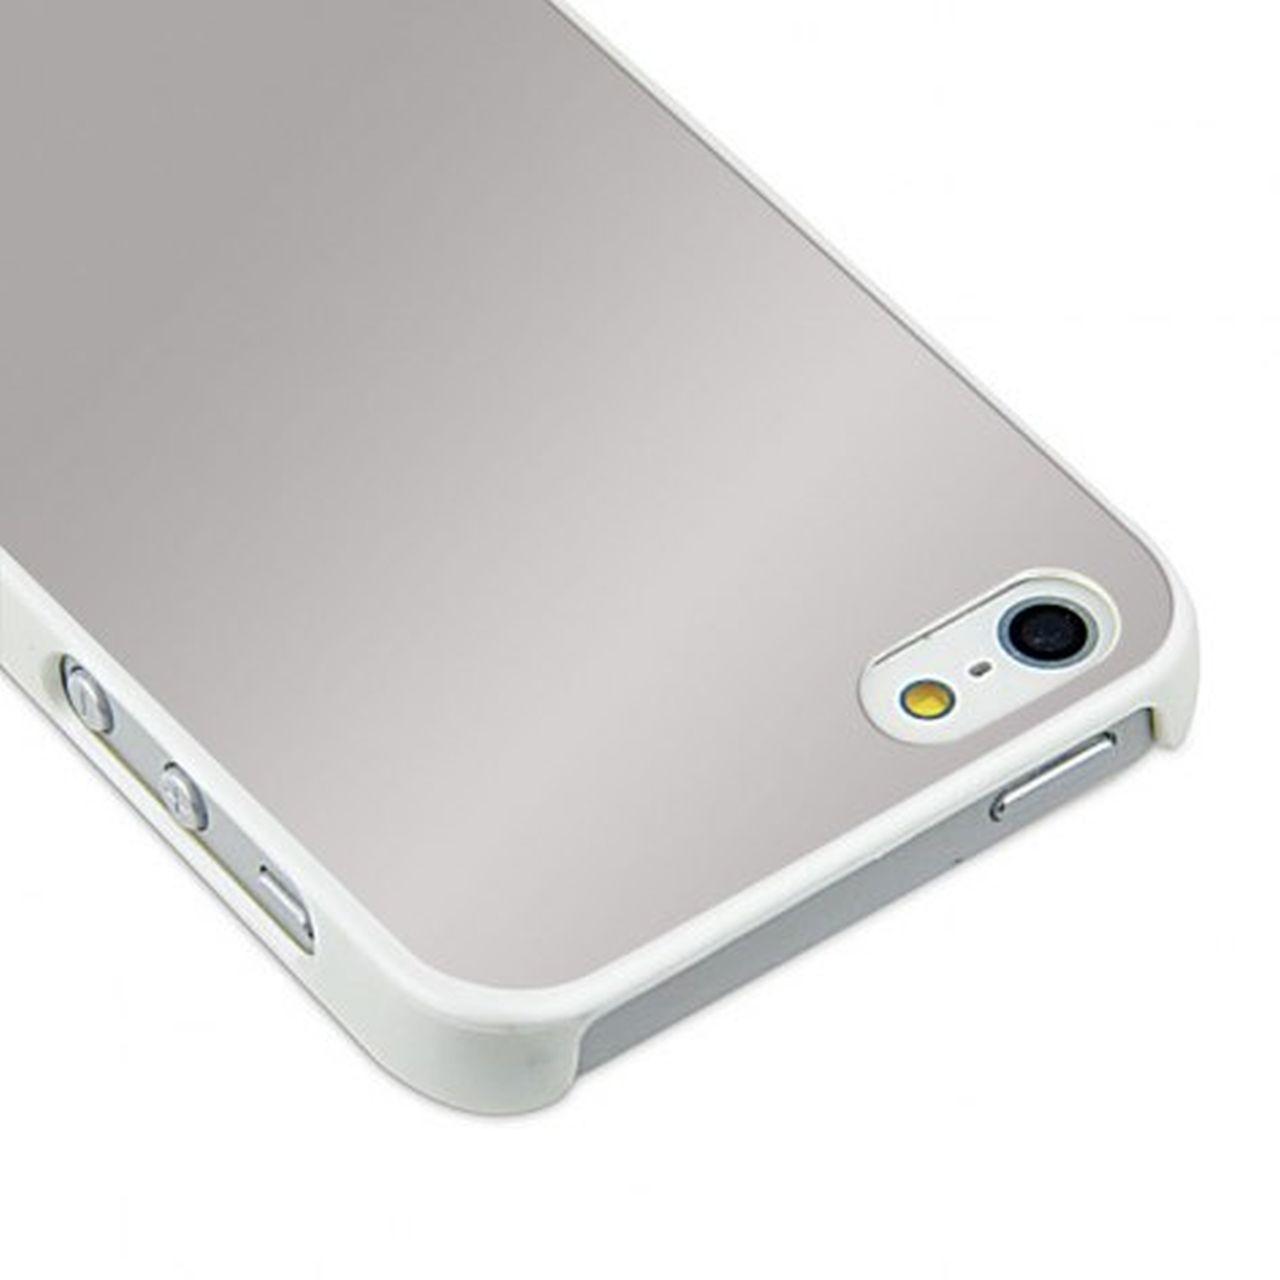 Sublicover bianca argento iphone-4